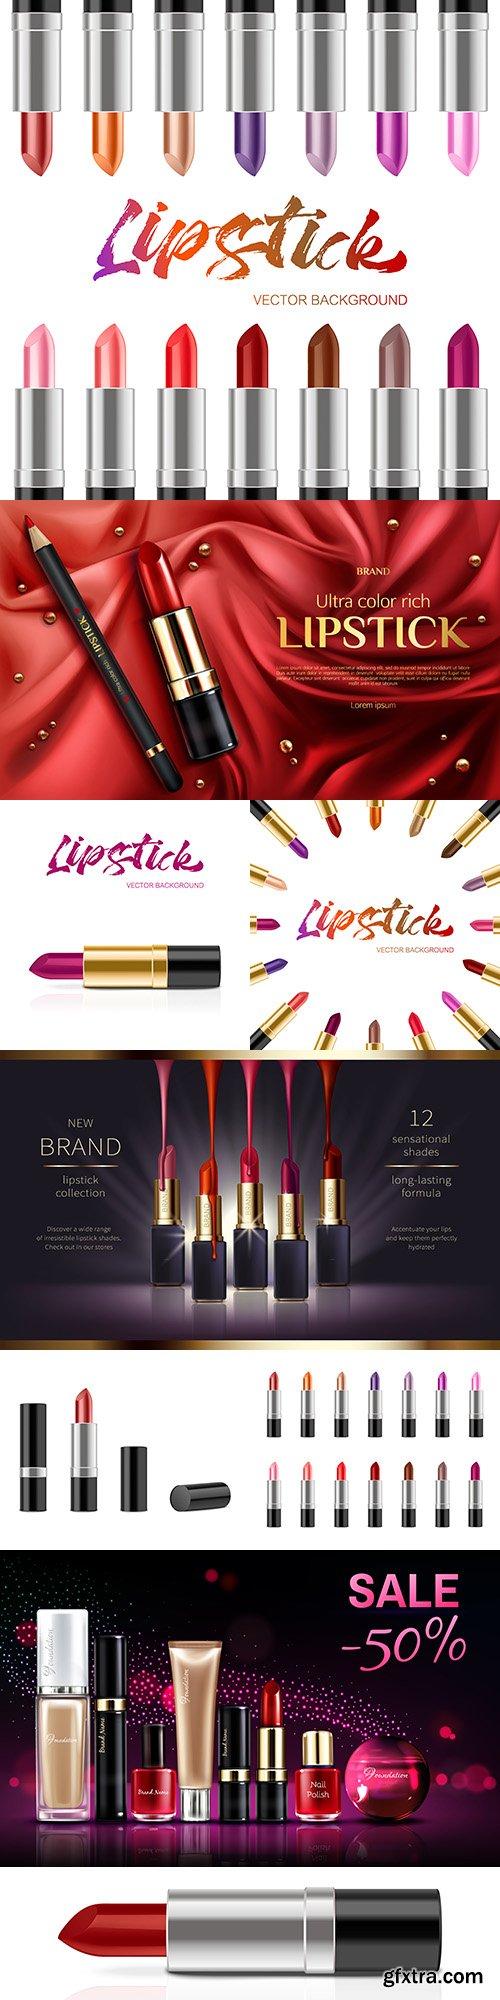 Lipstick cosmetics product banner design 3d illustration